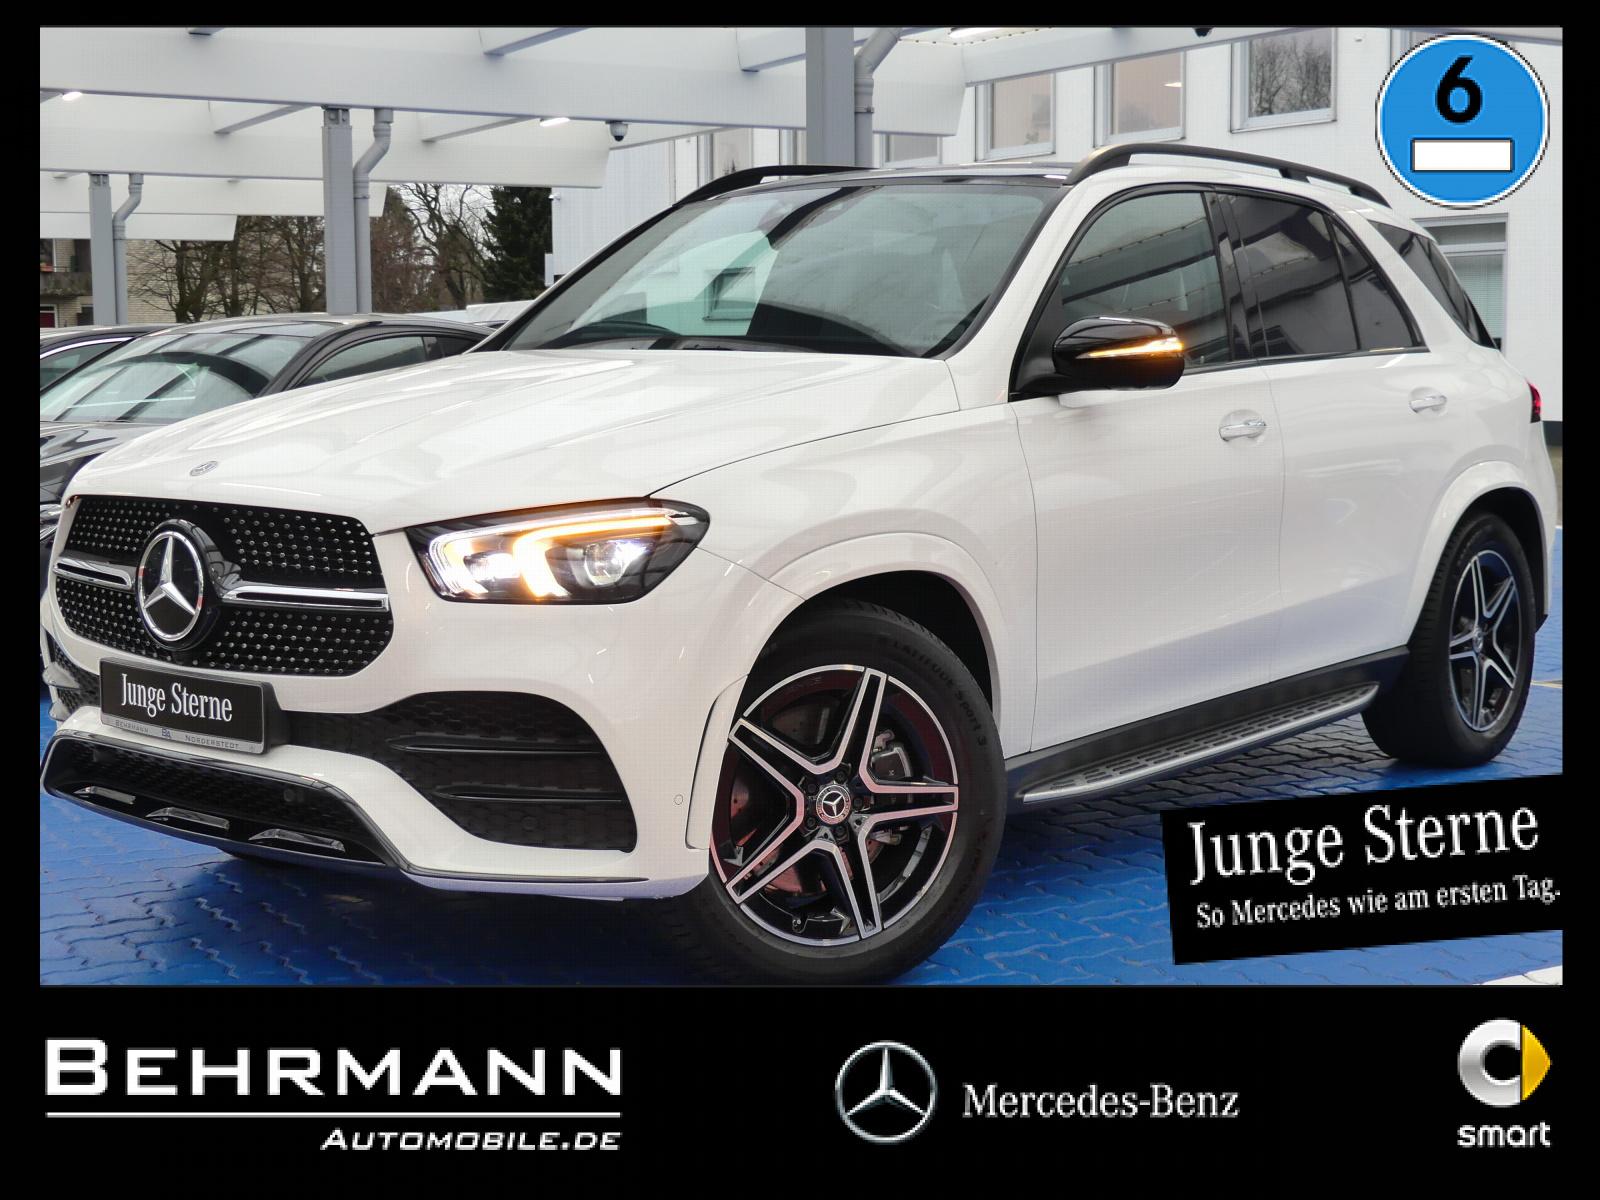 Mercedes-Benz GLE 400 d AMG 4M +MBUX+Widescreen+Panorama+360°+, Jahr 2019, Diesel